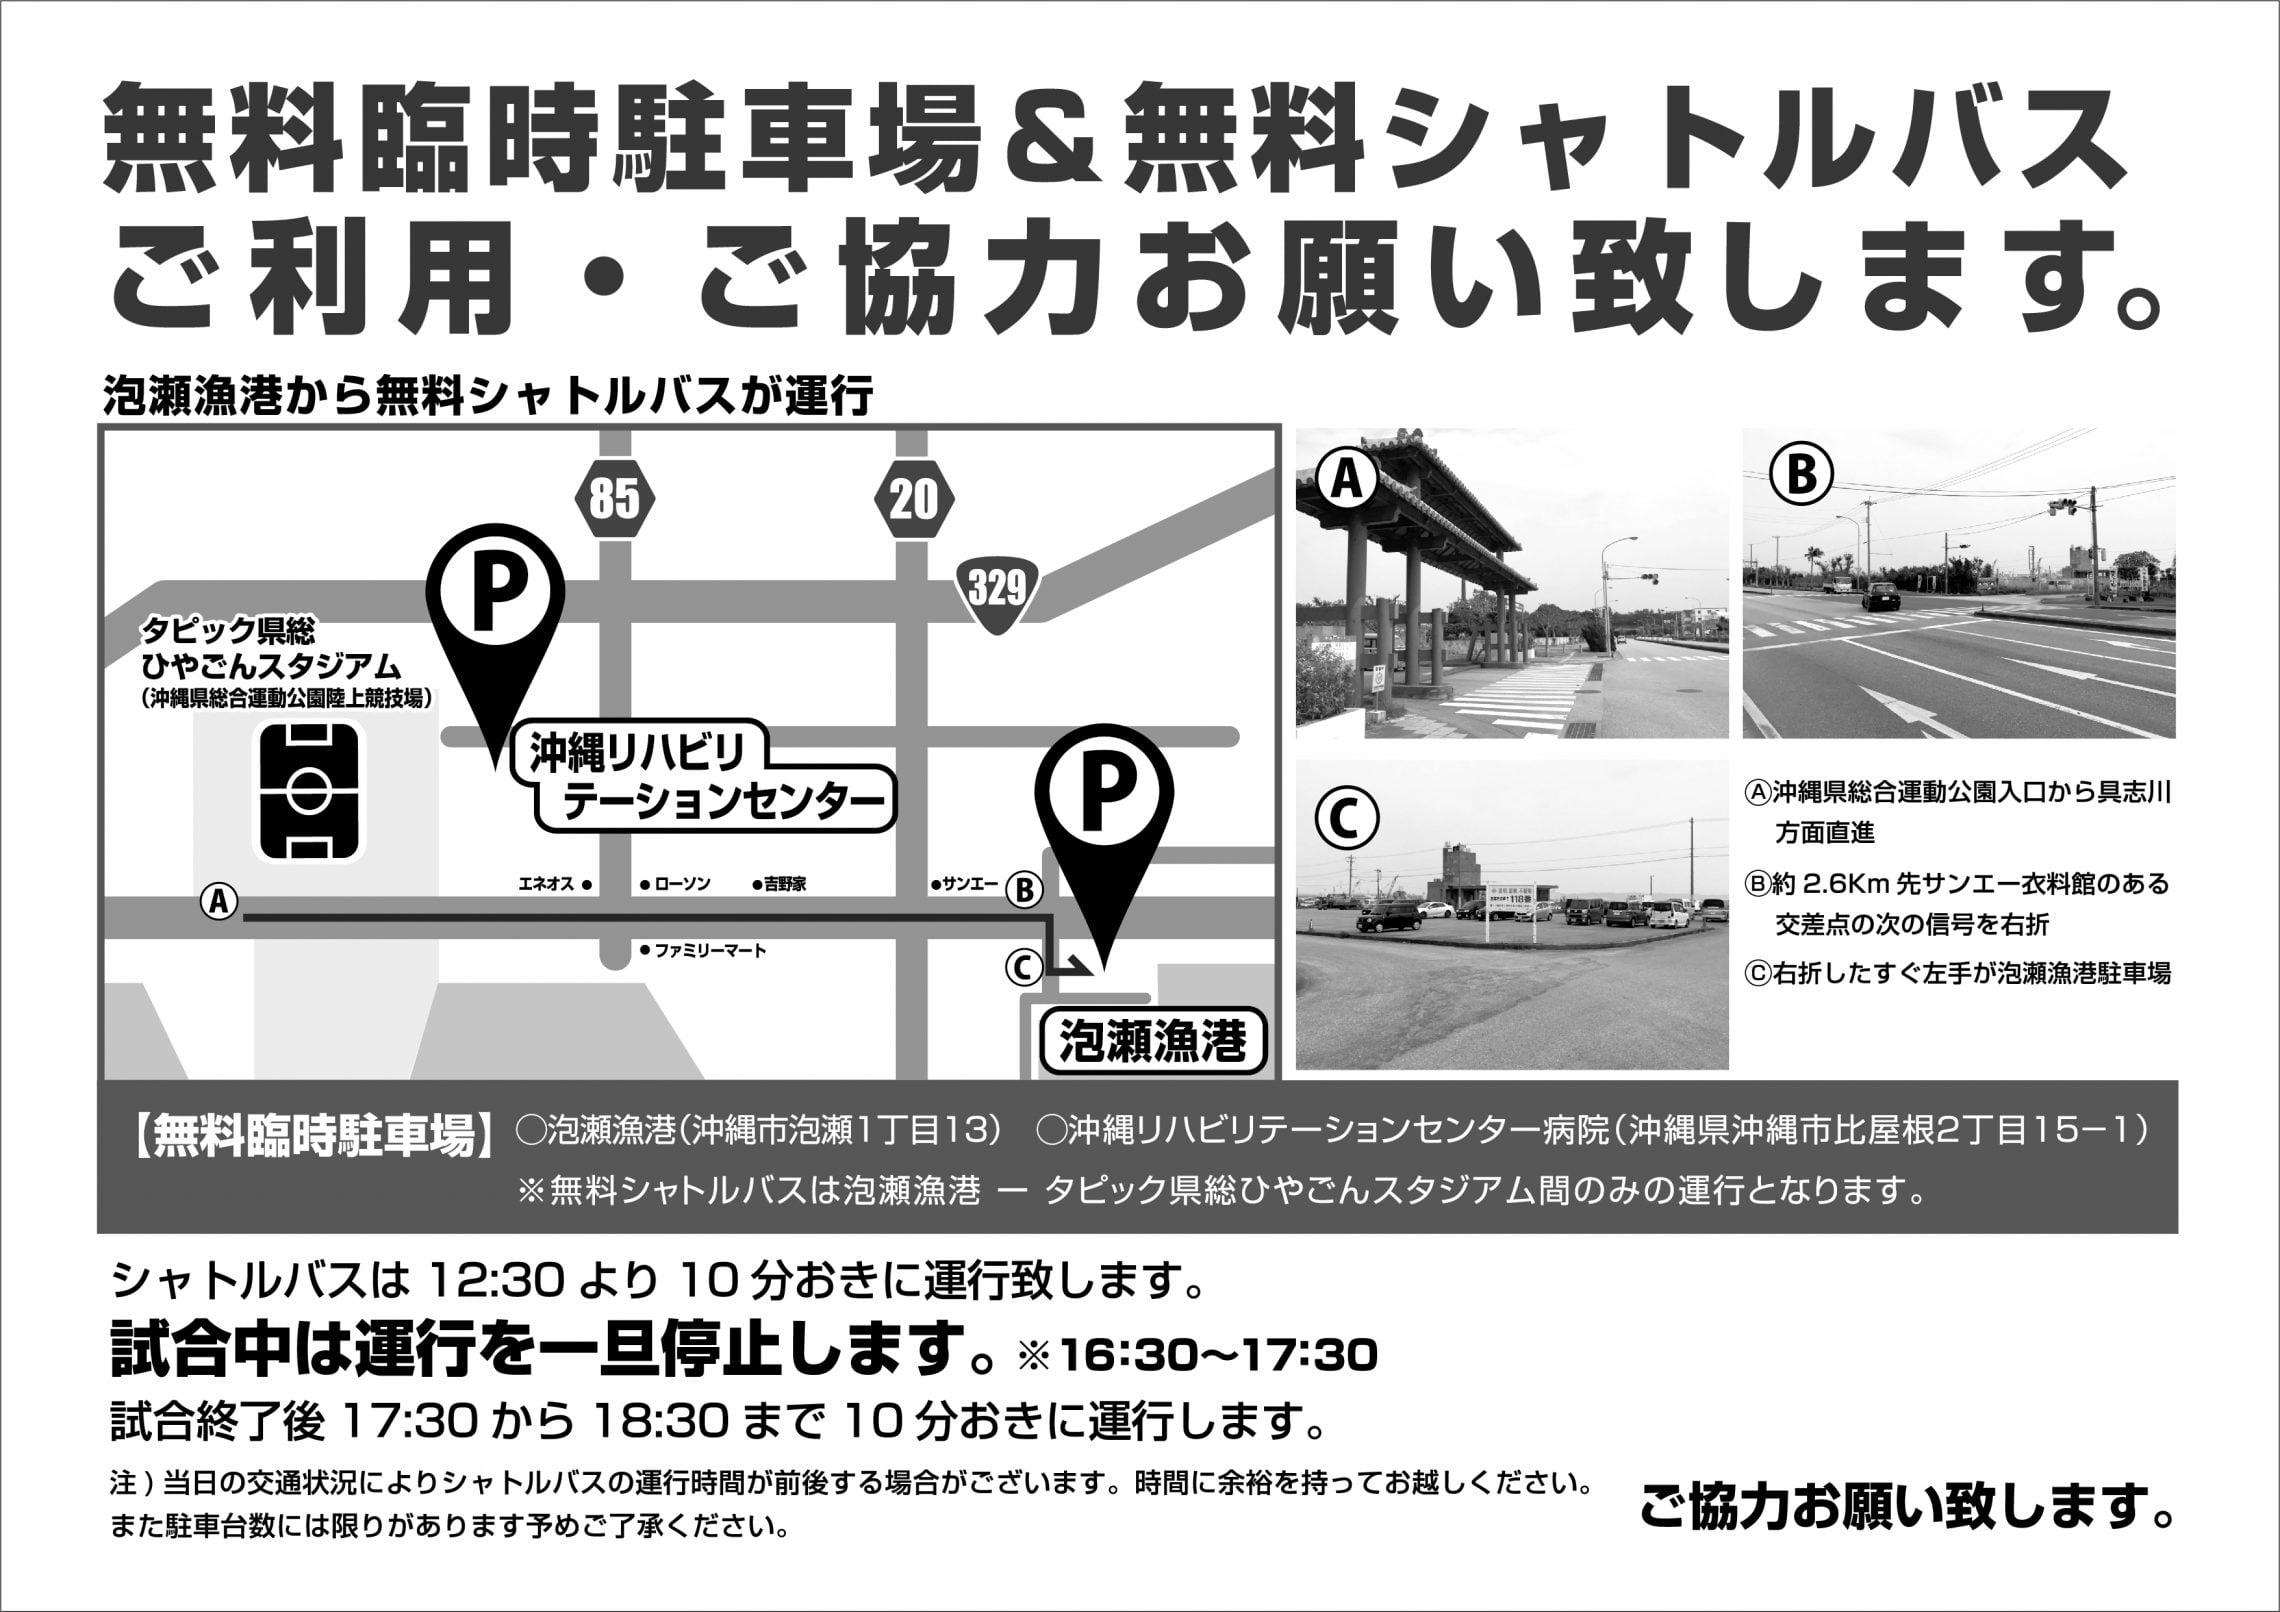 201213_map_leafret